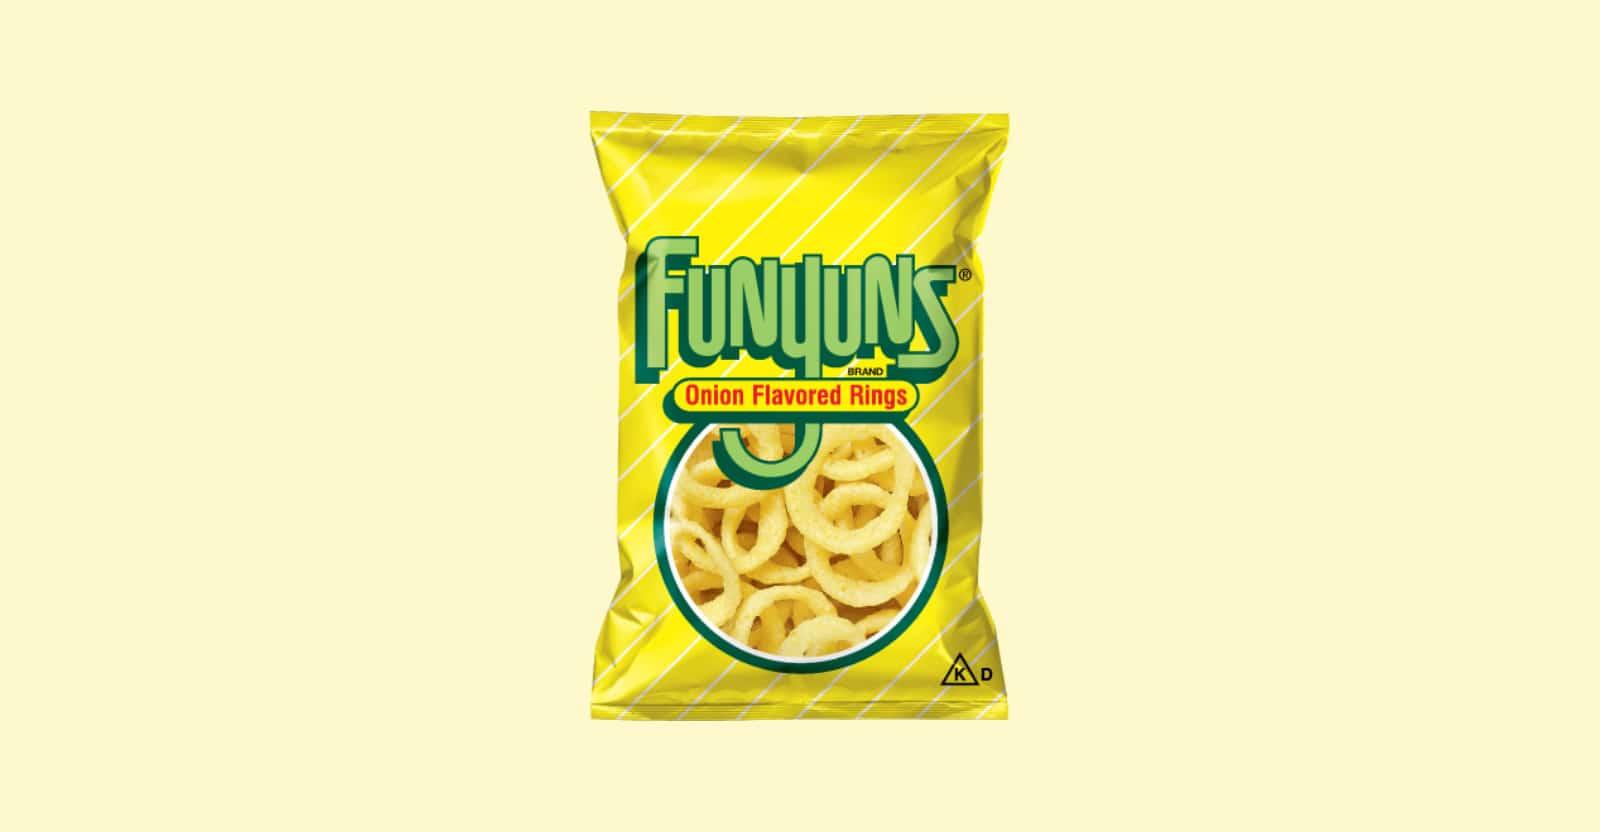 are funyuns gluten-free